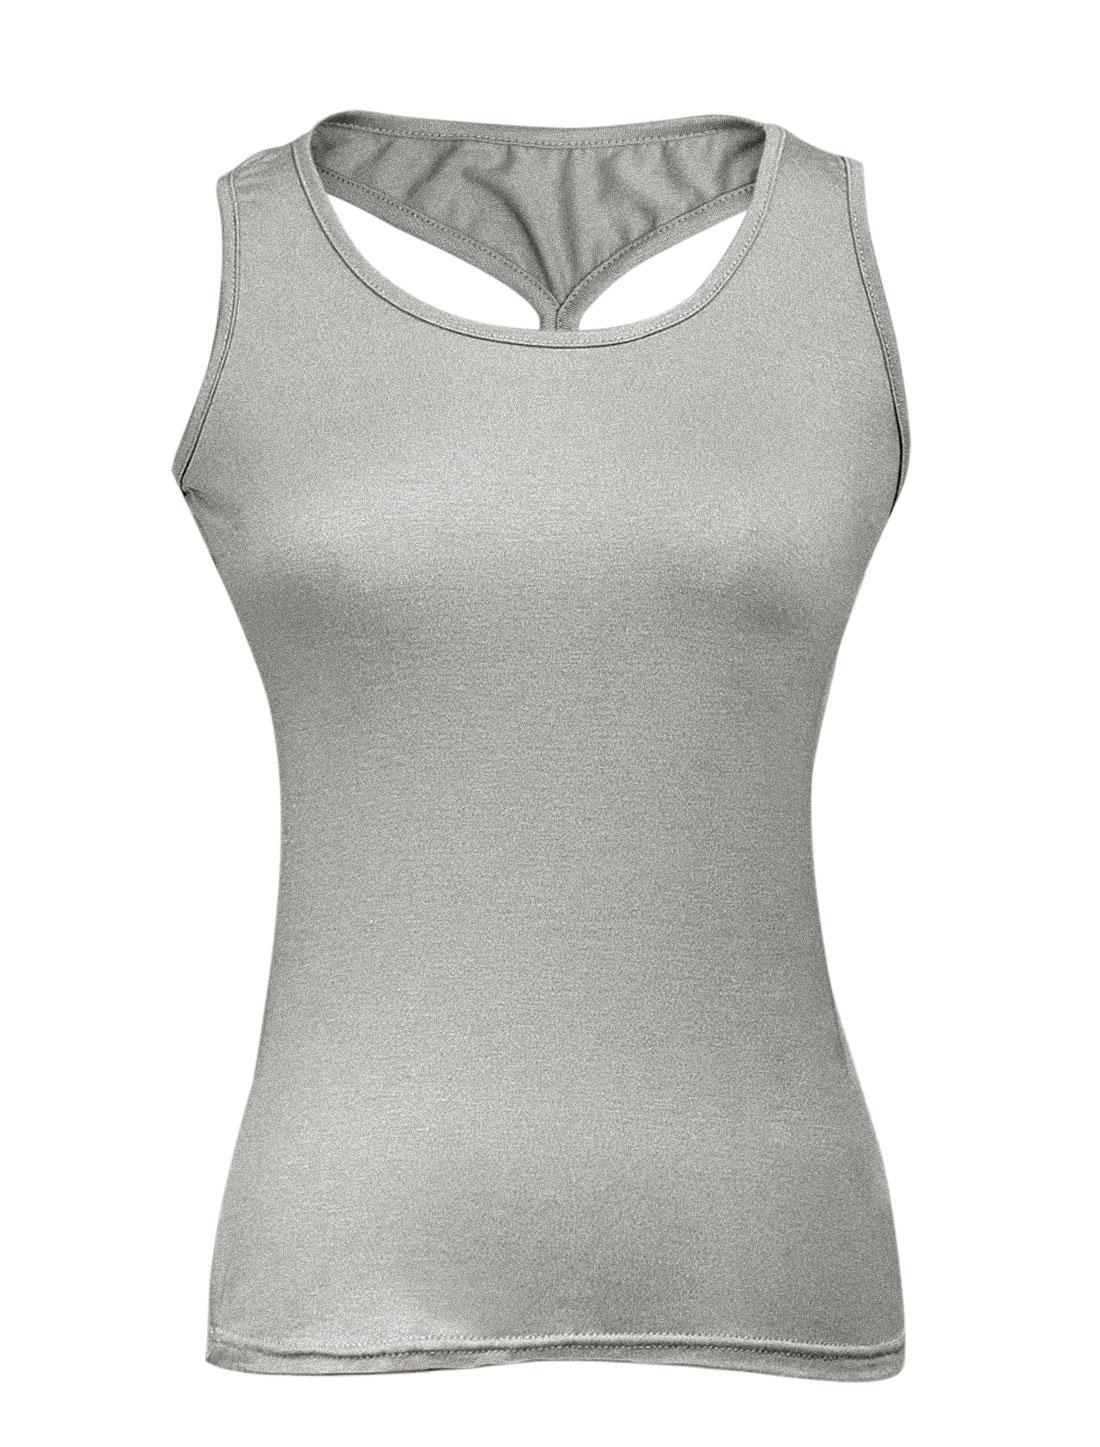 Women Sexy Sleeveless Cross Back Stretch Tank Top Light Gray XS